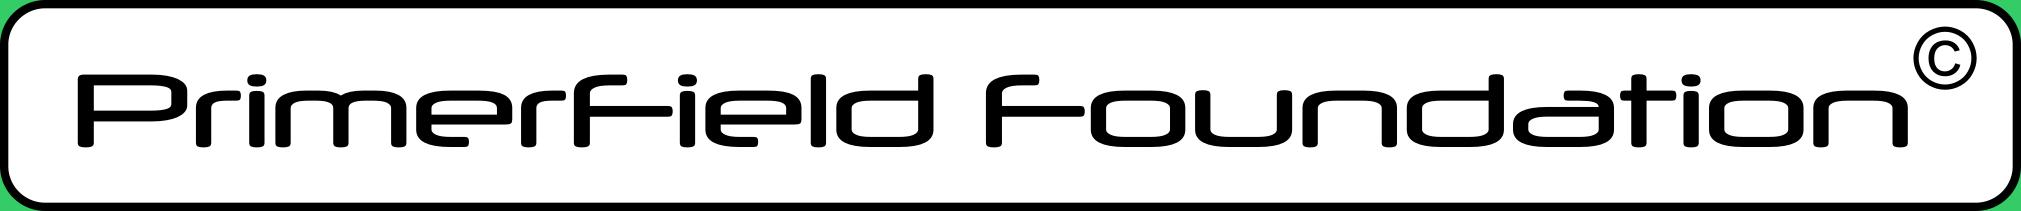 PrimerField Foundation Logo 2.png